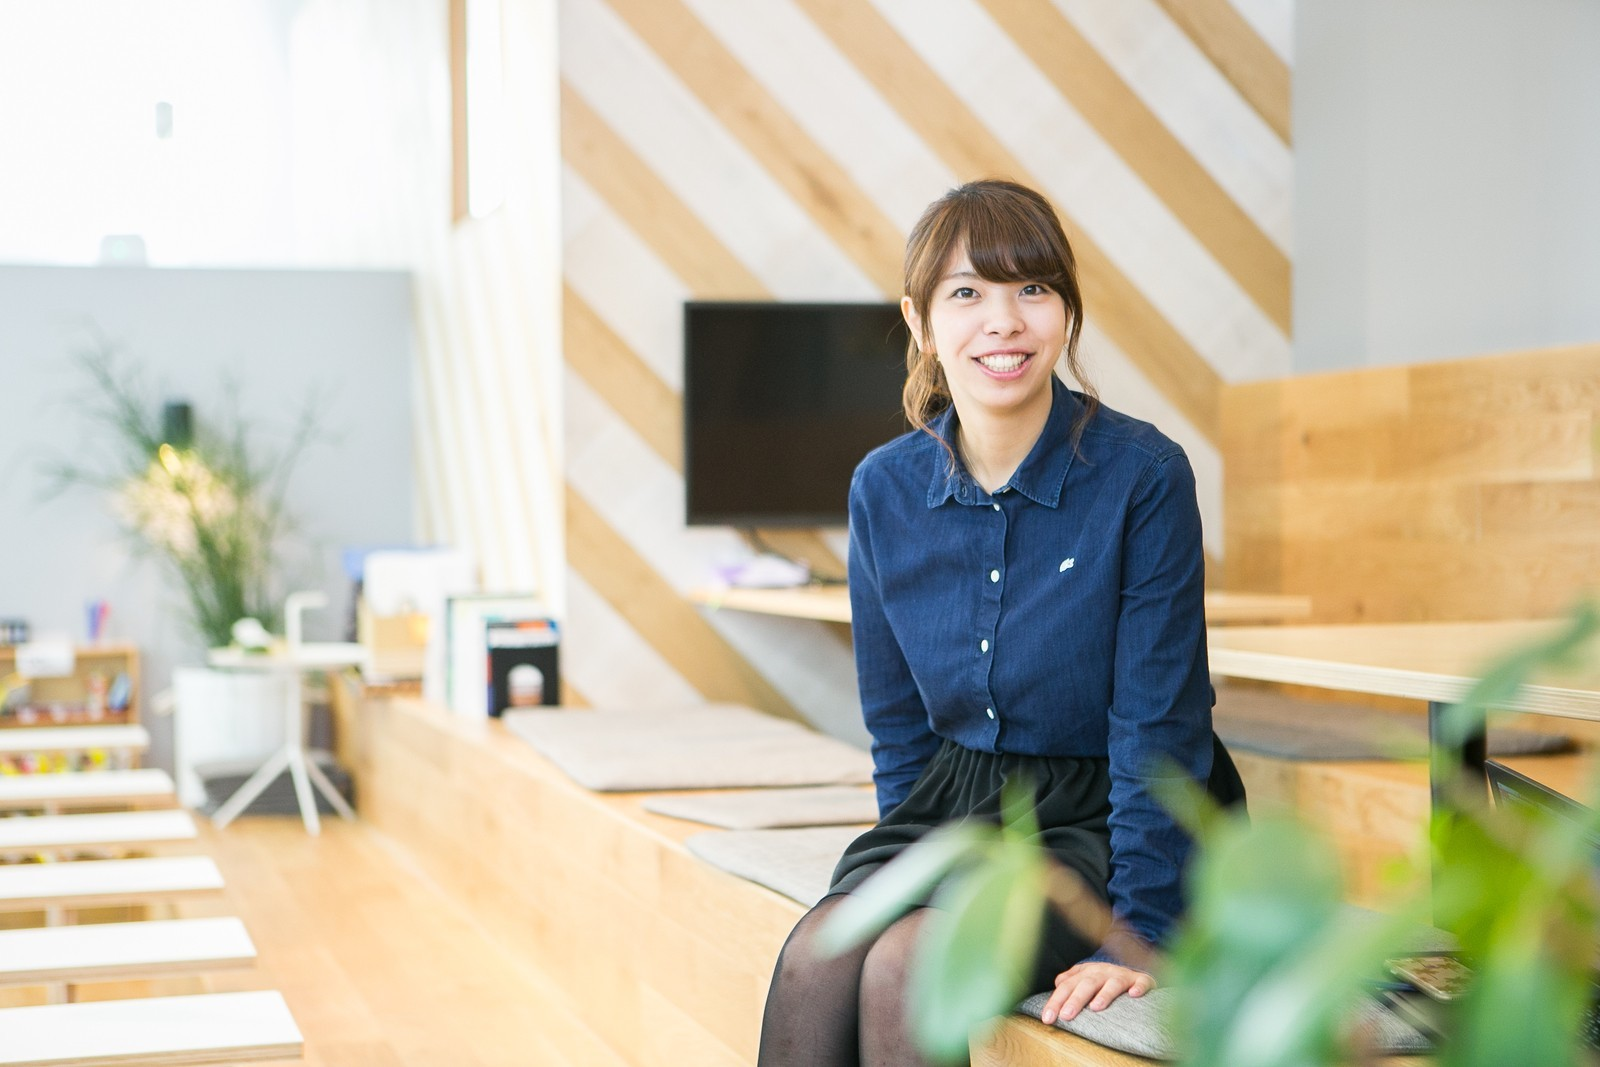 Kawaiiを世界に発信!女子向けアバターアプリ『CocoPPa Play』を開発するサーバーエンジニアを募集!